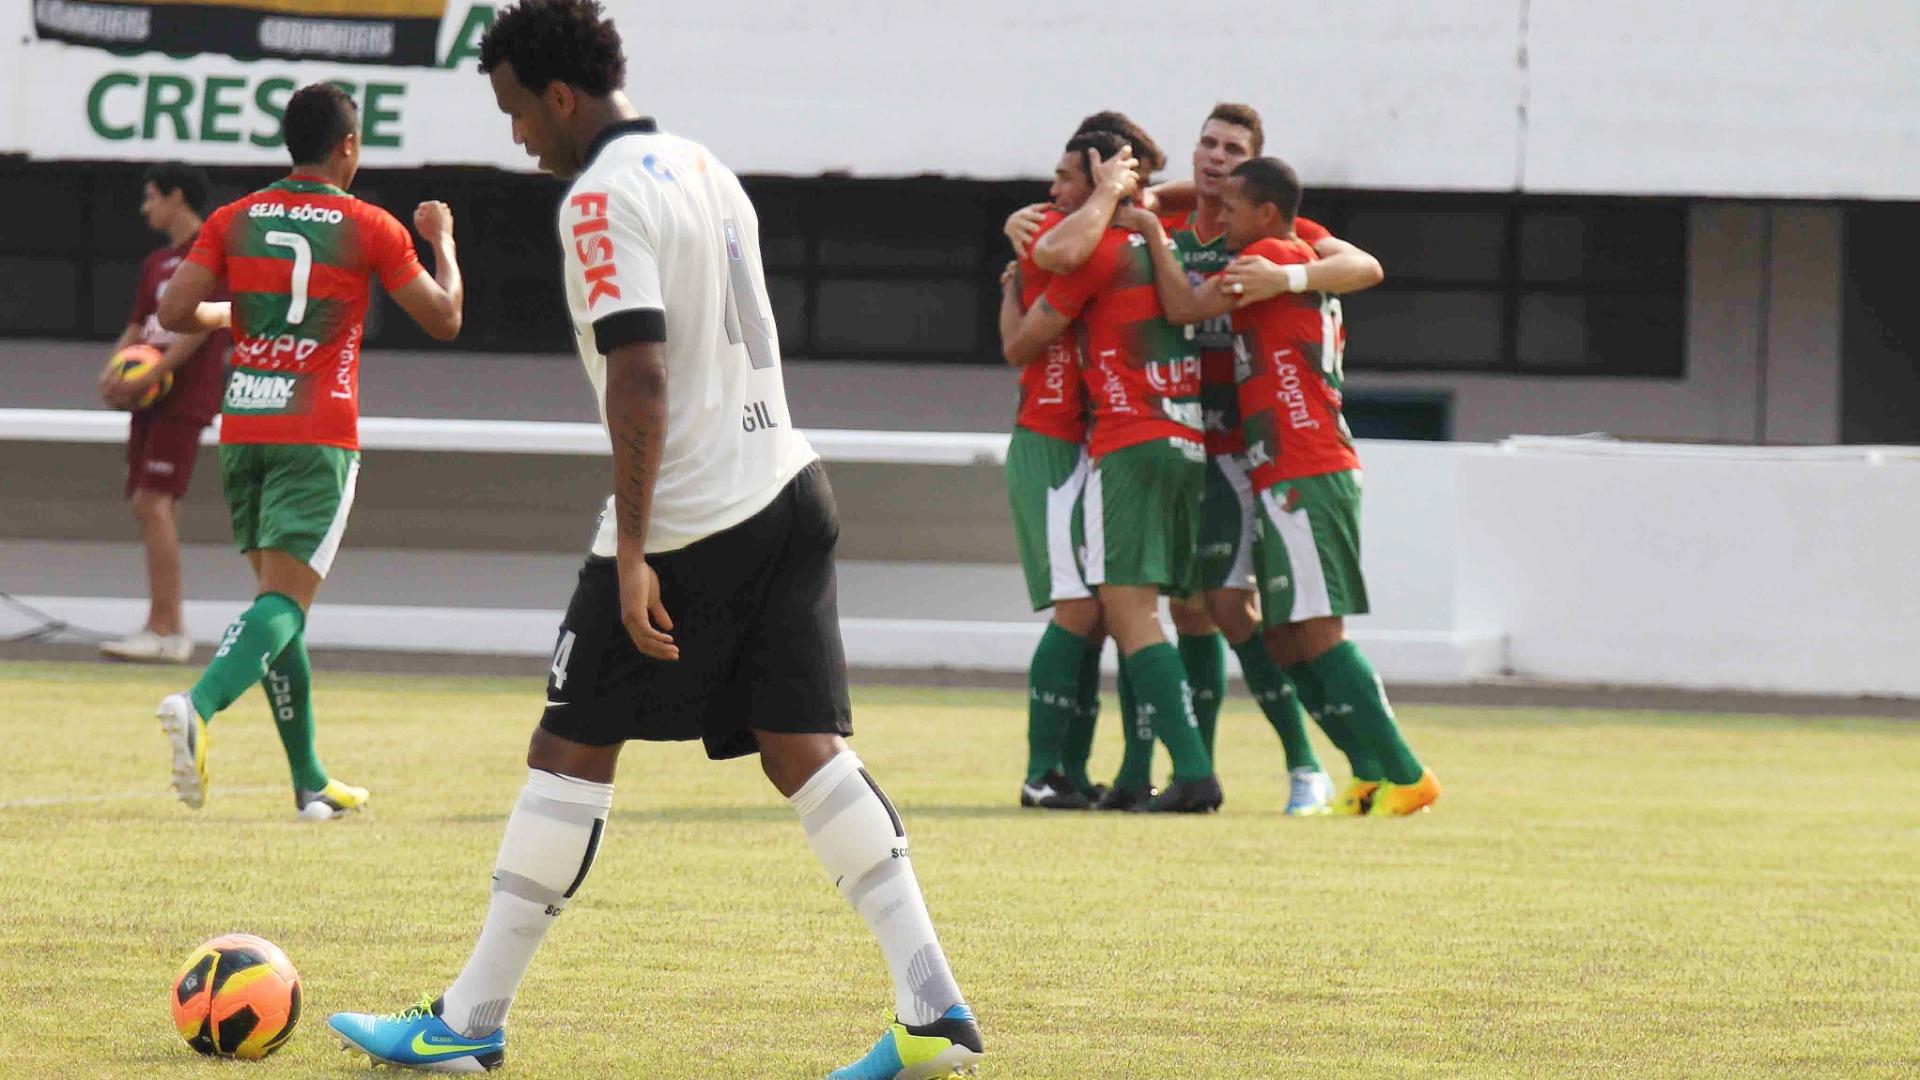 29.set.2013 - Jogadores da Portuguesa comemoram gol de Gilberto contra o Corinthians, pelo Campeonato Brasileiro